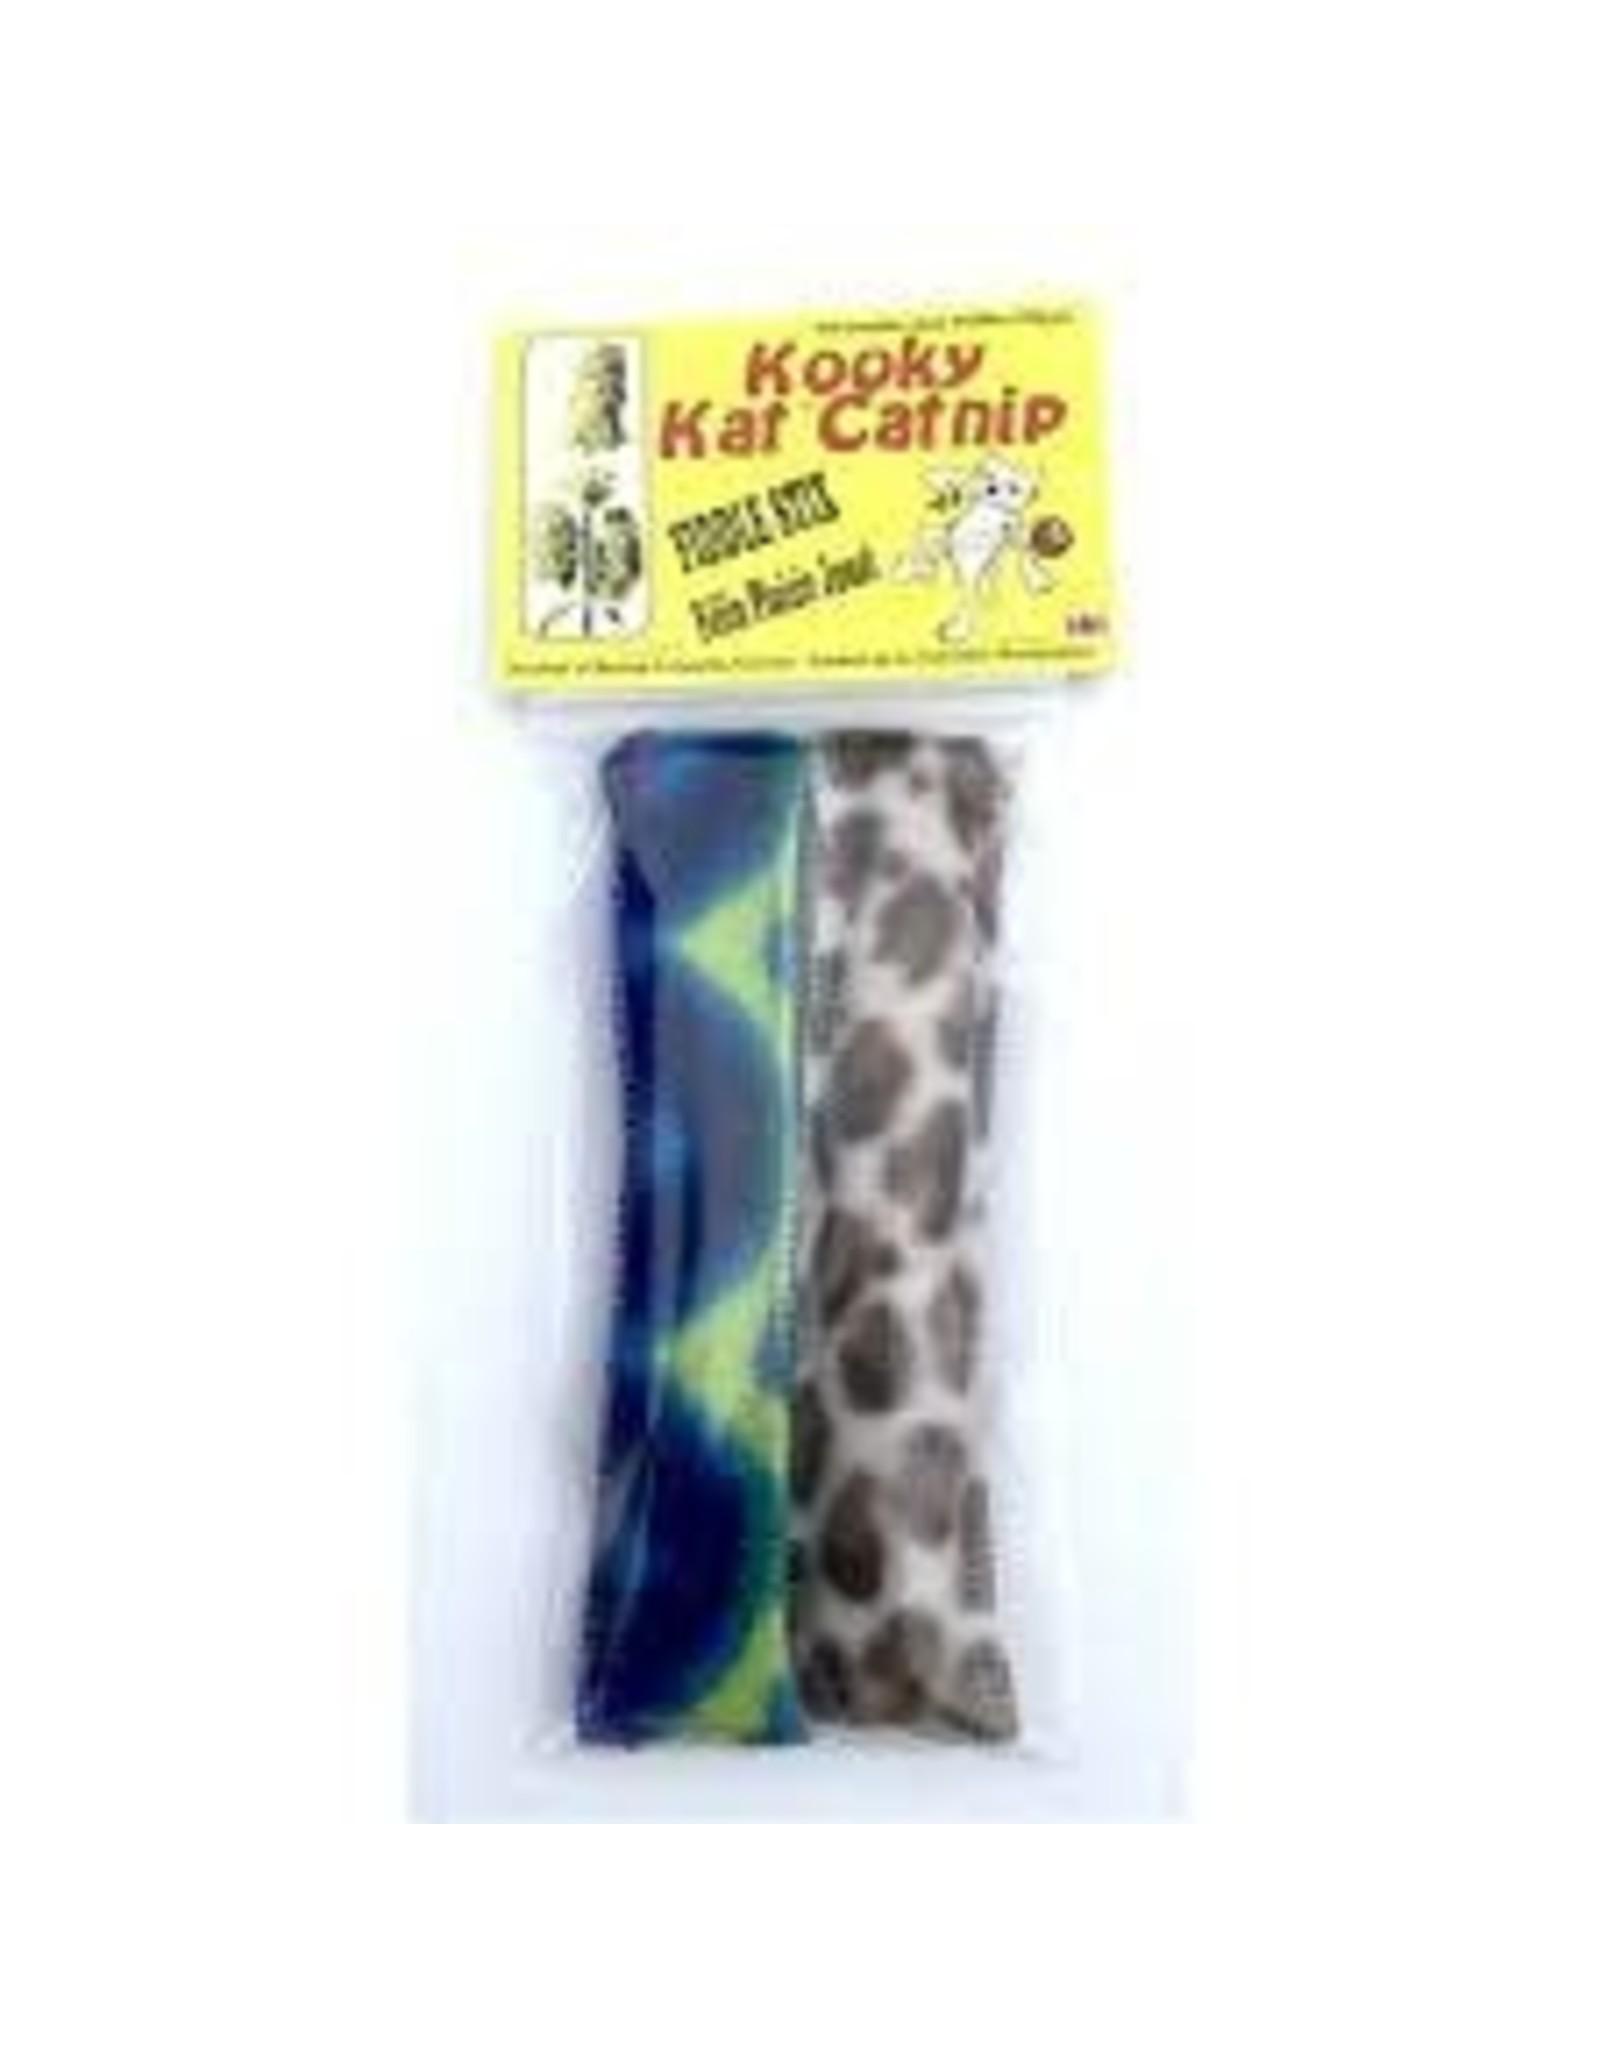 Kooky Kat Catnip Kooky Cat Catnip - Fiddle Stix 2pk 20g each